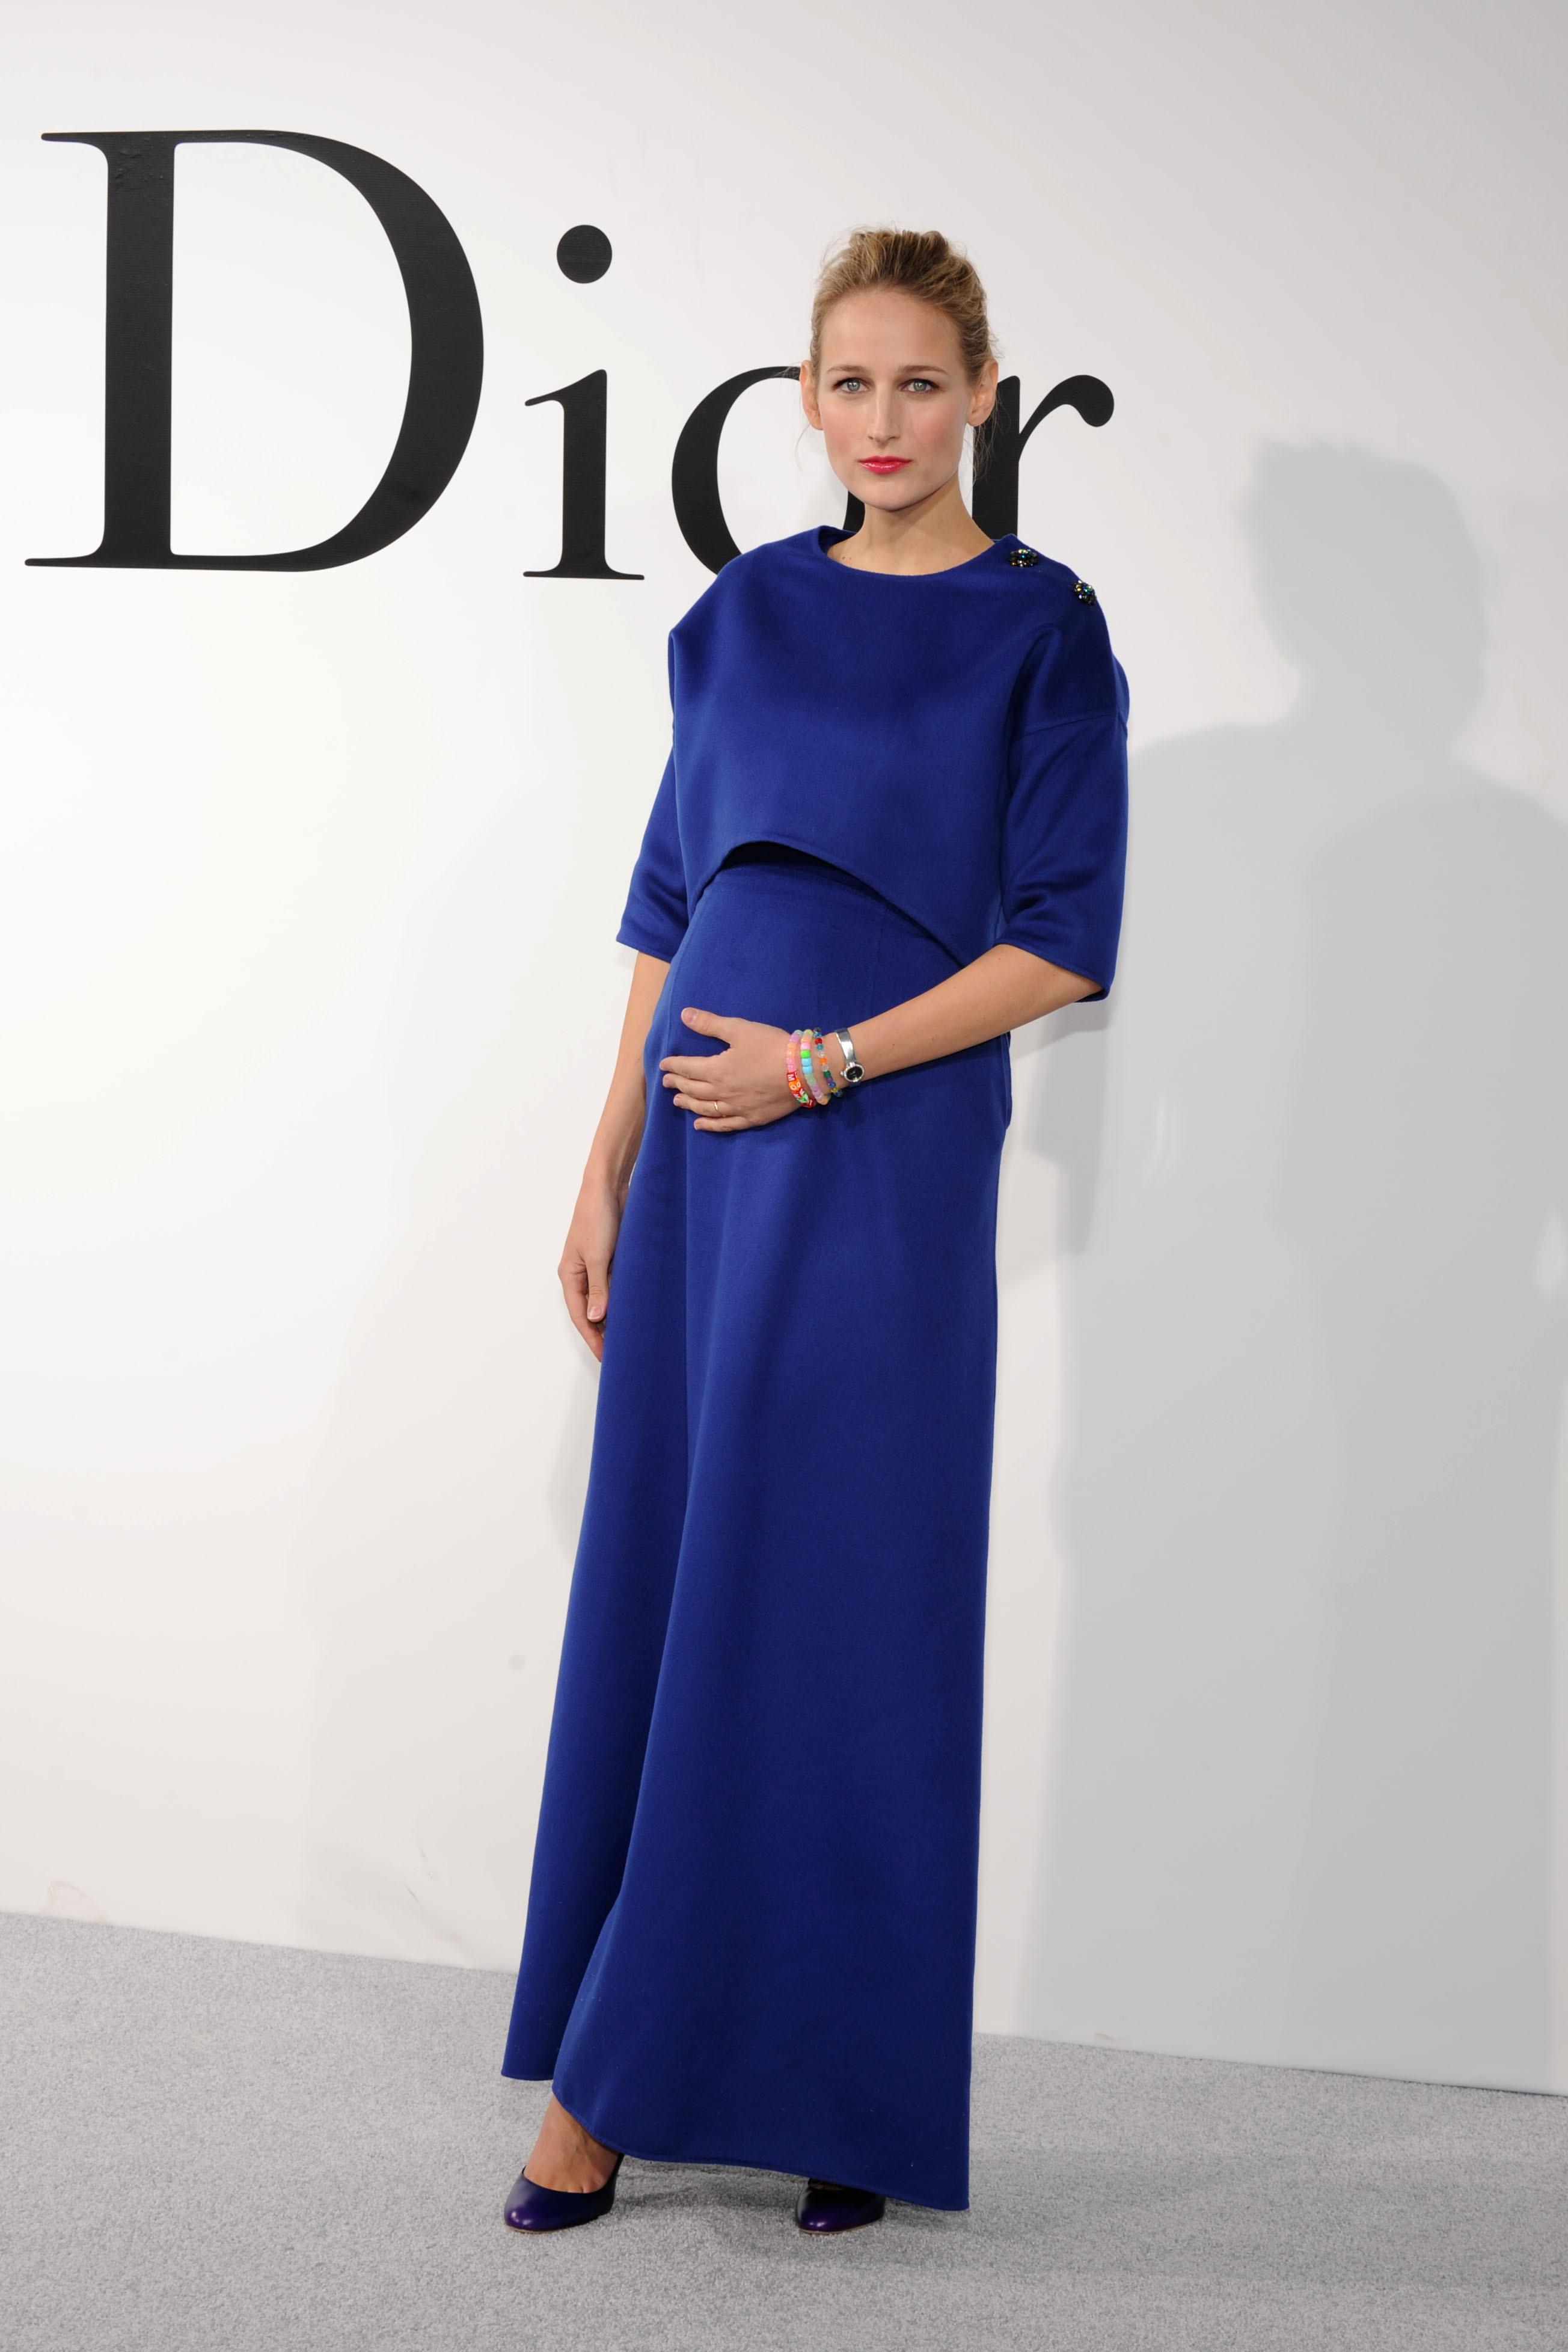 Leelee Sobieski Christian Dior Cruise 2015 Show In